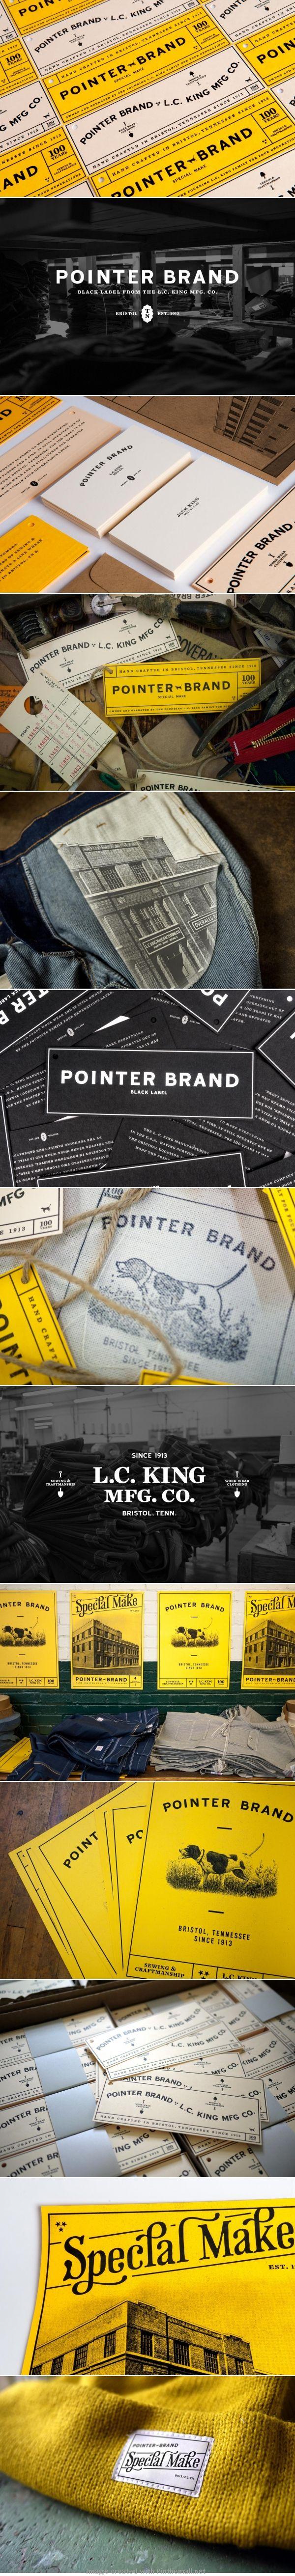 Pointer brand logo label corporate branding visual graphic